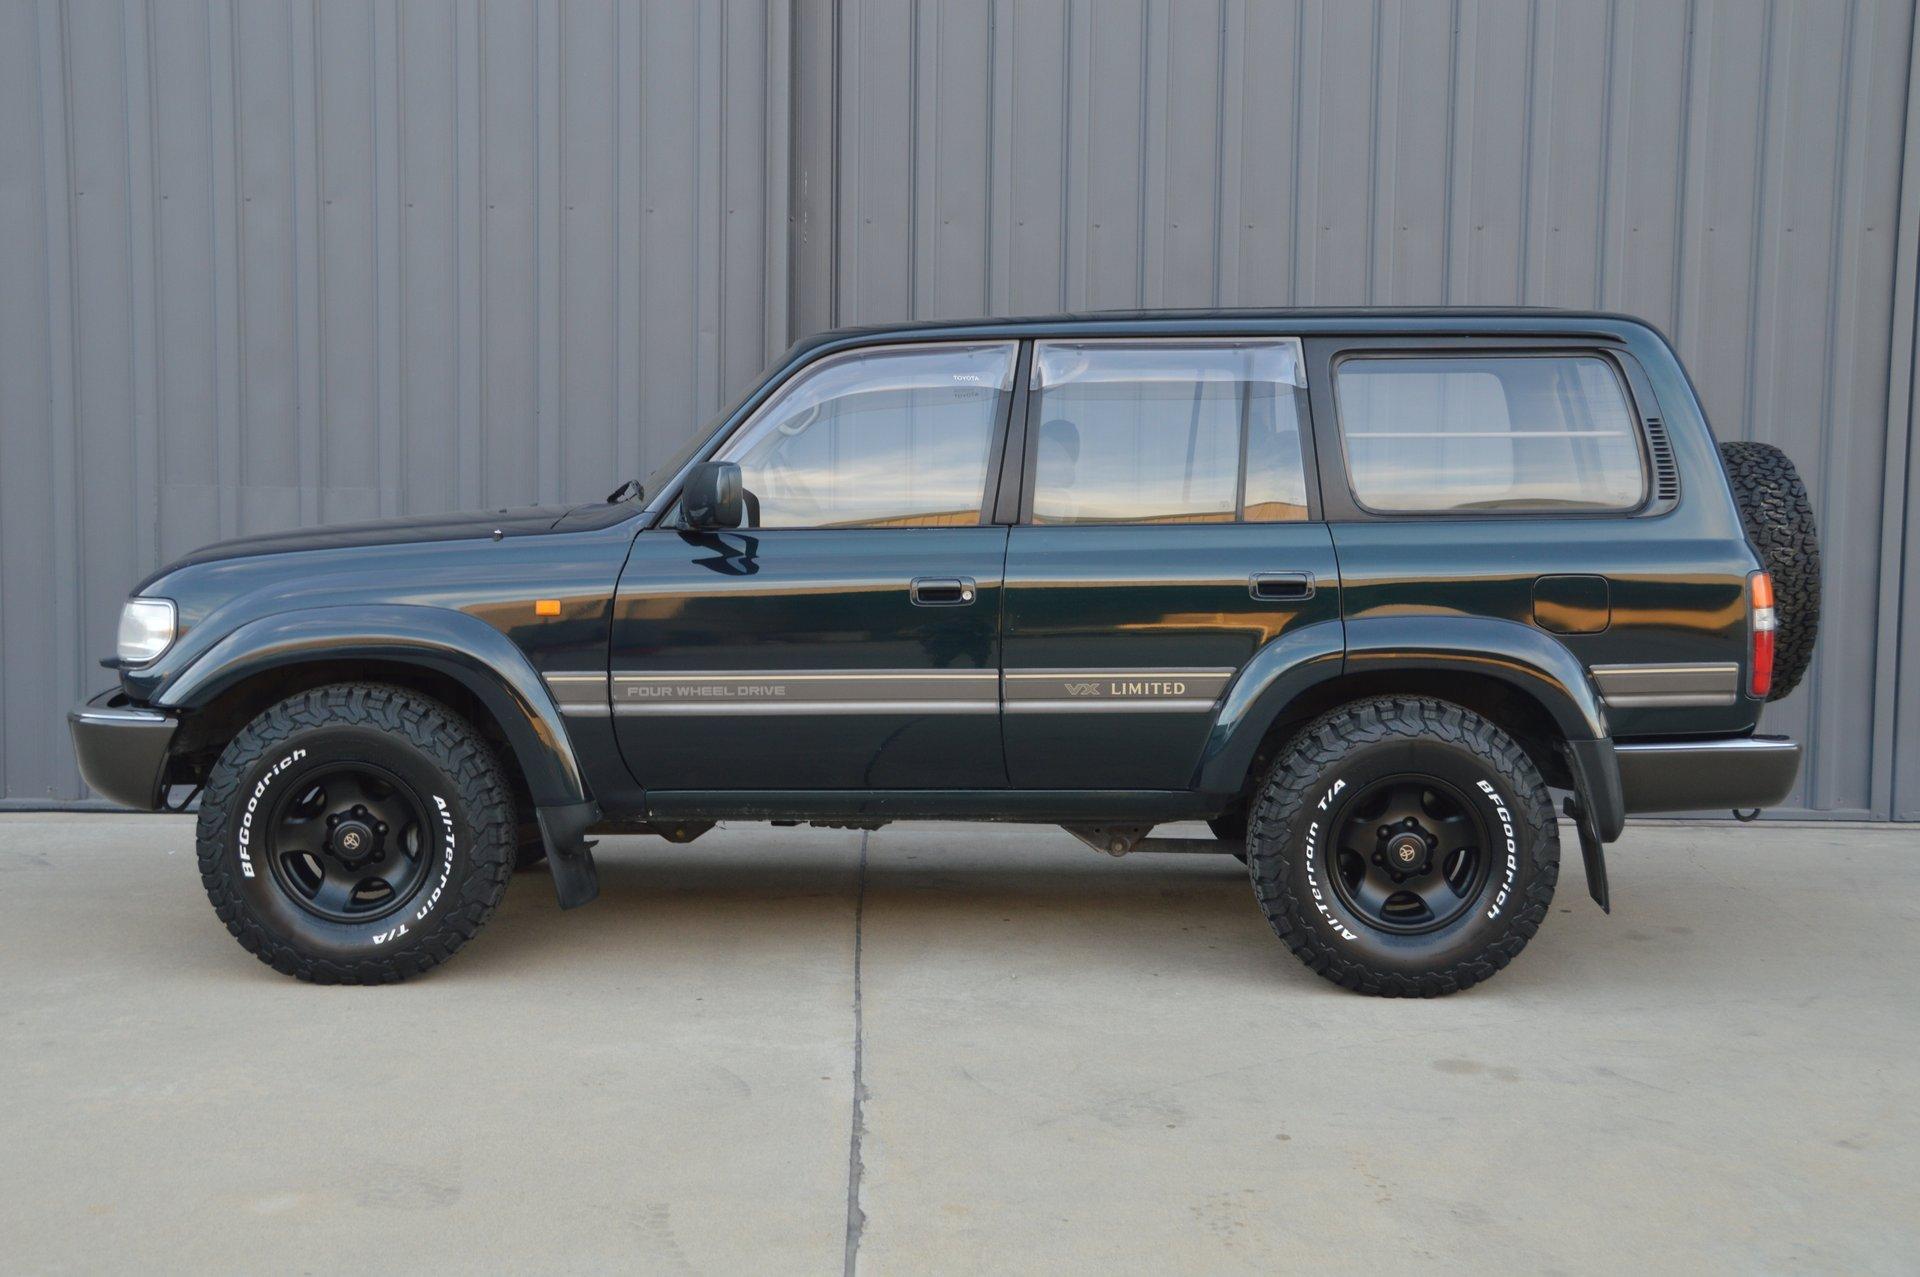 1992 Toyota Land Cruiser | Toprank Importers